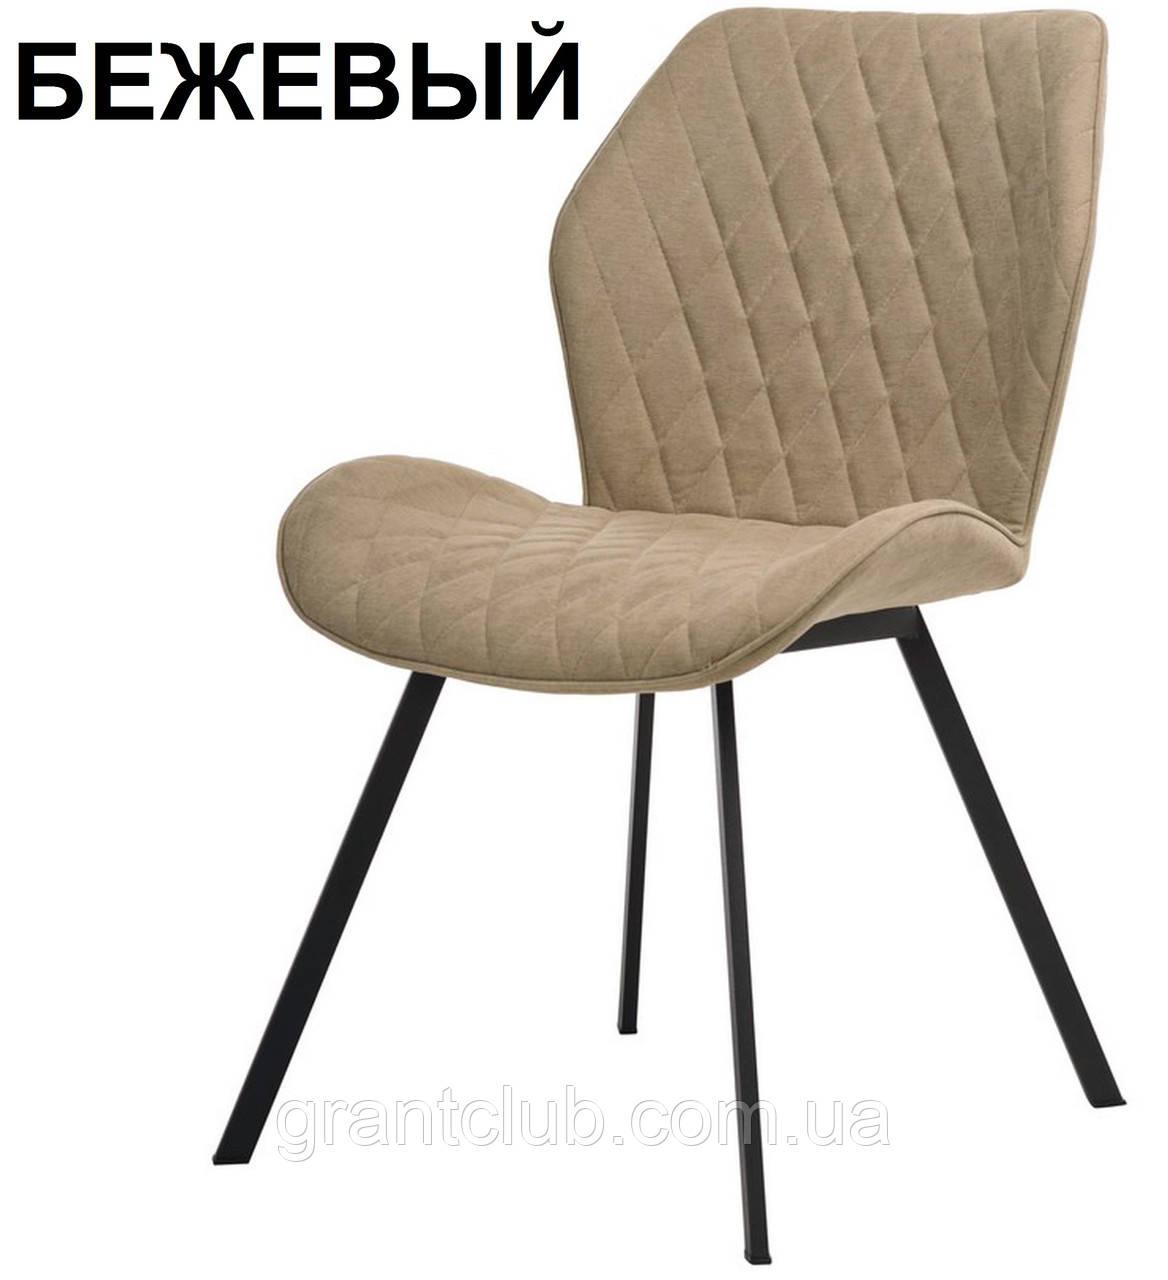 Мягкий стул M-40 бежевый на черных ножках Vetro Mebel